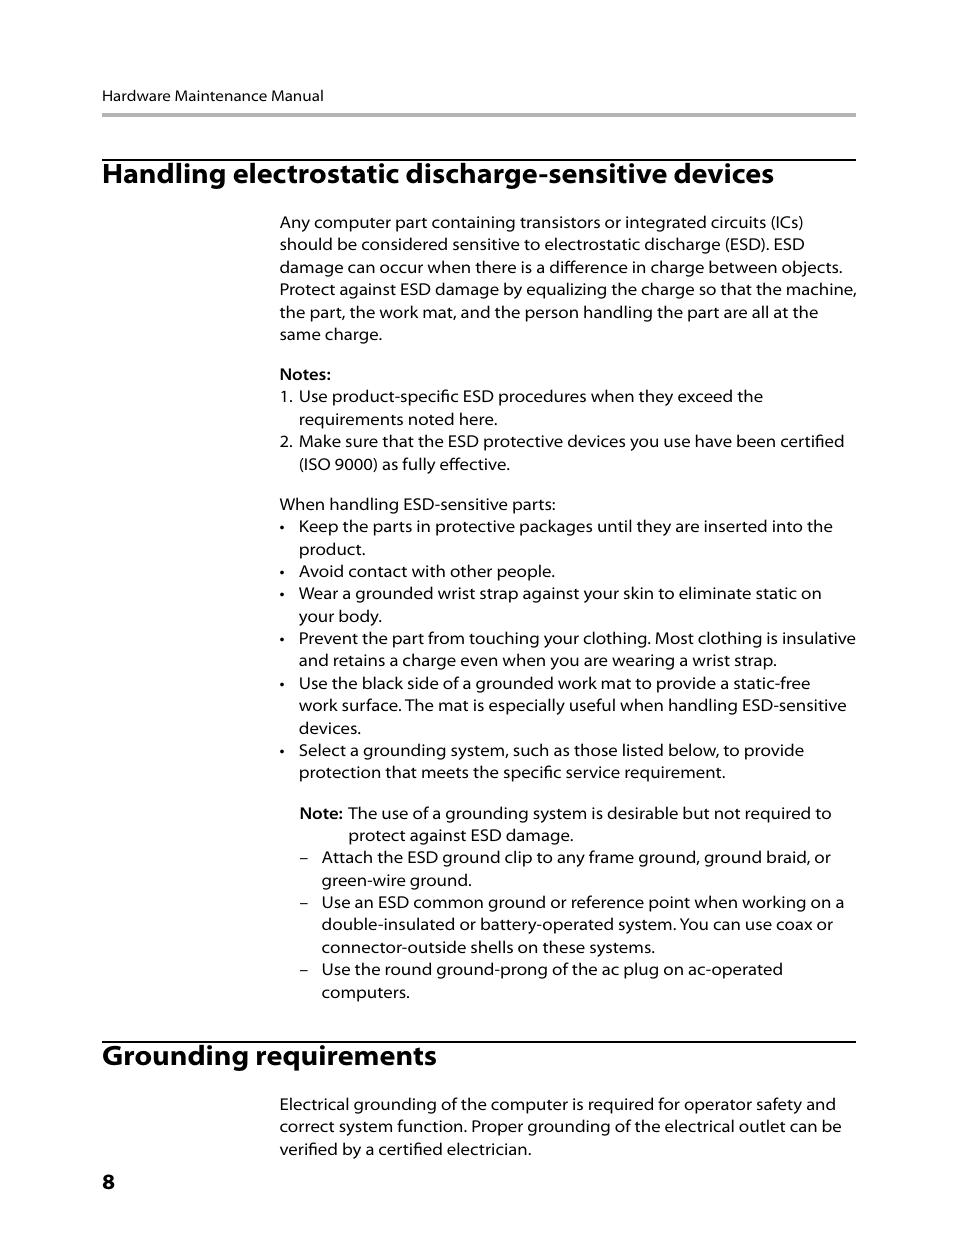 Handling electrostatic discharge-sensitive devices, Grounding ...